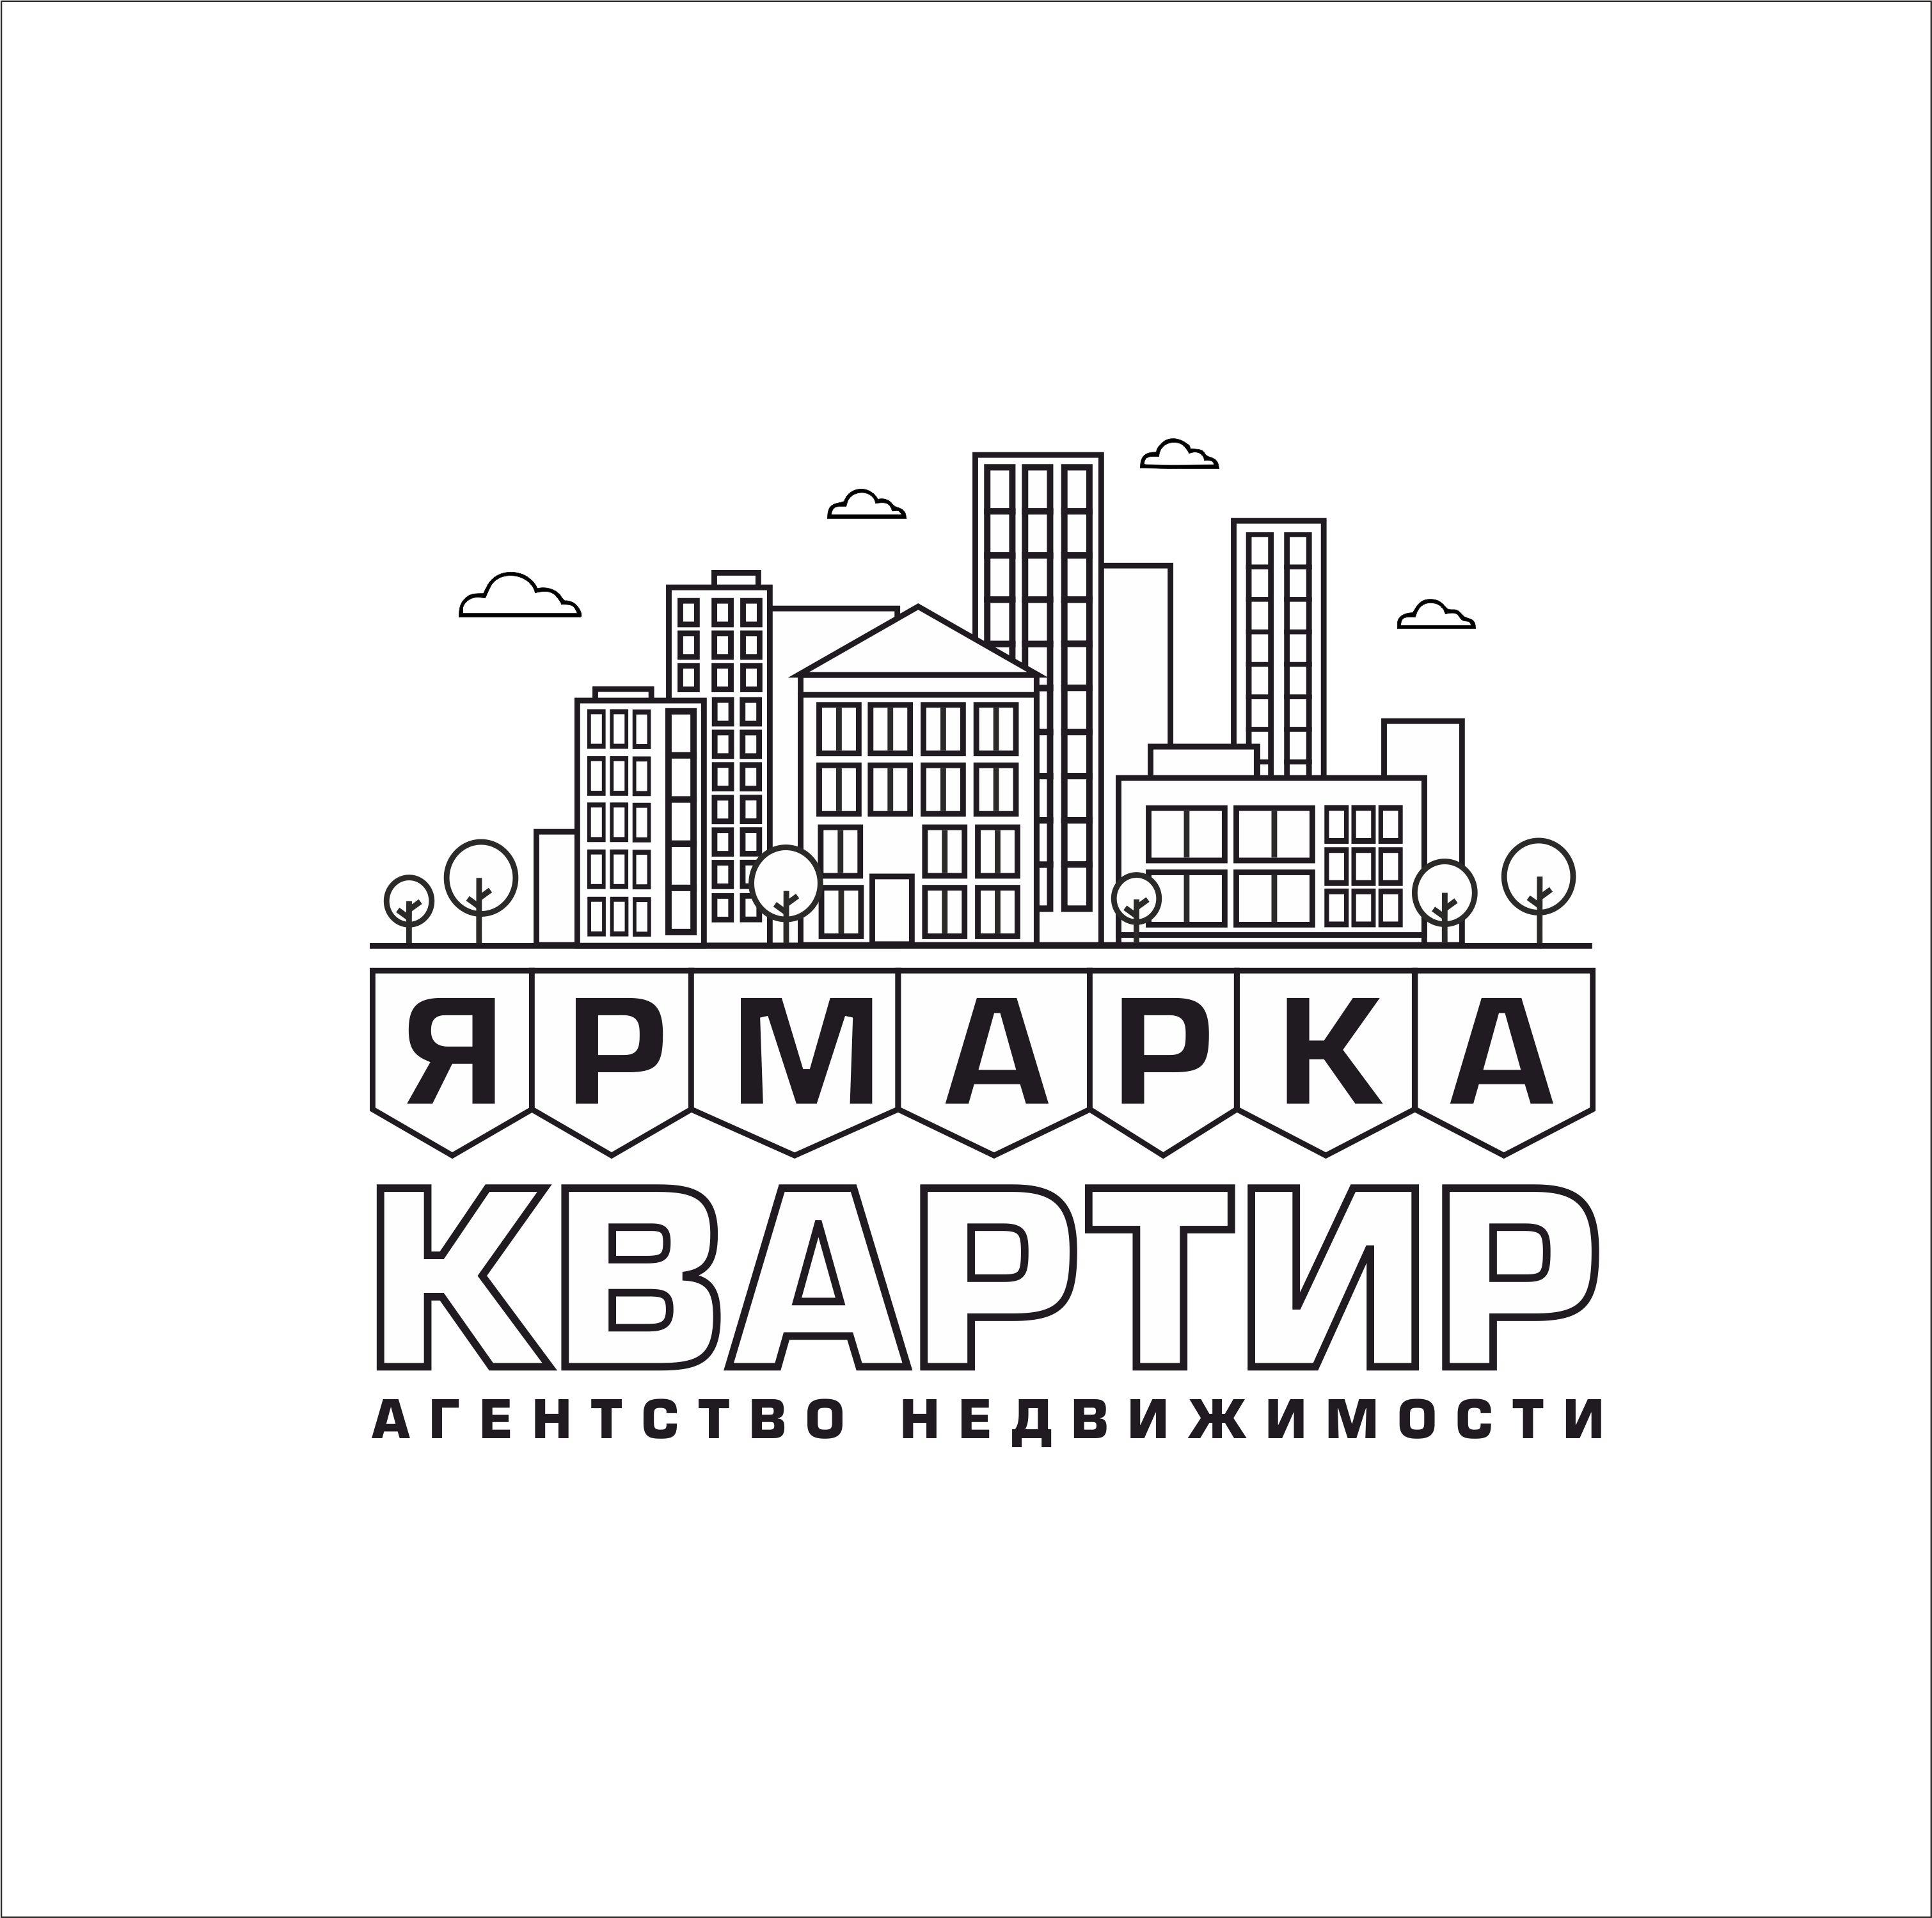 Создание логотипа, с вариантами для визитки и листовки фото f_82460085b12866b8.jpg